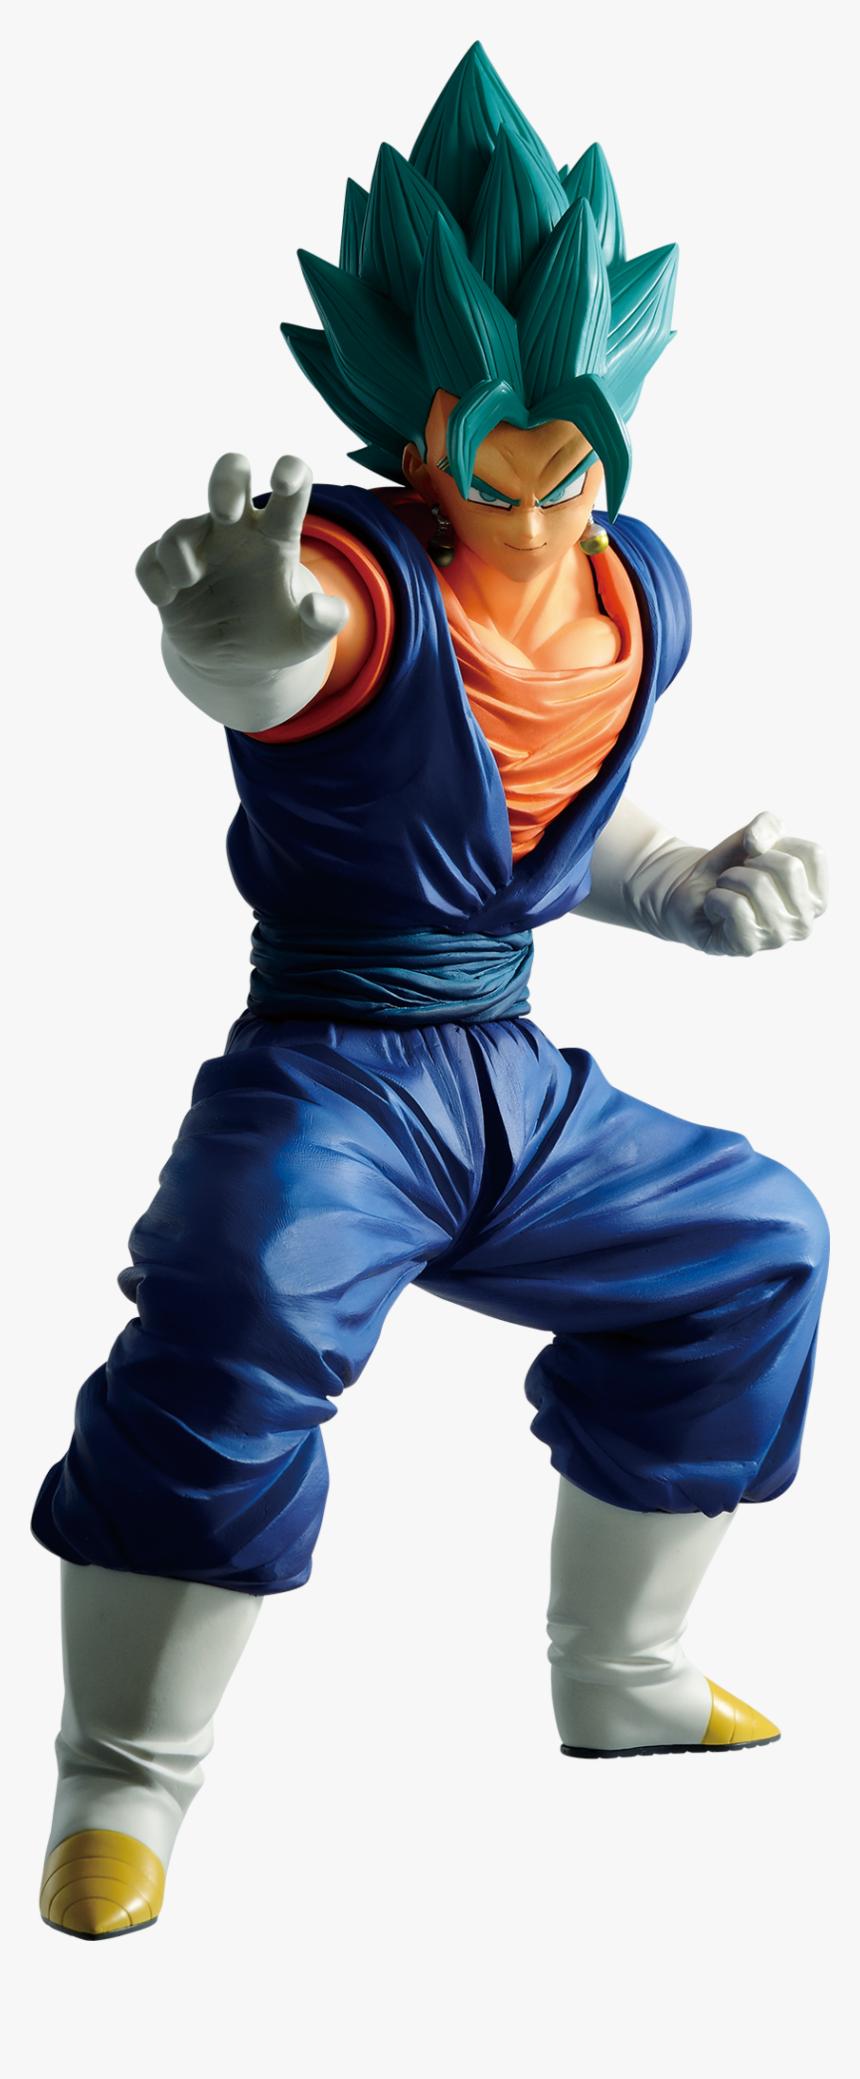 Vegito - Super Dragon Ball Heroes Ichiban Kuji, HD Png Download, Free Download